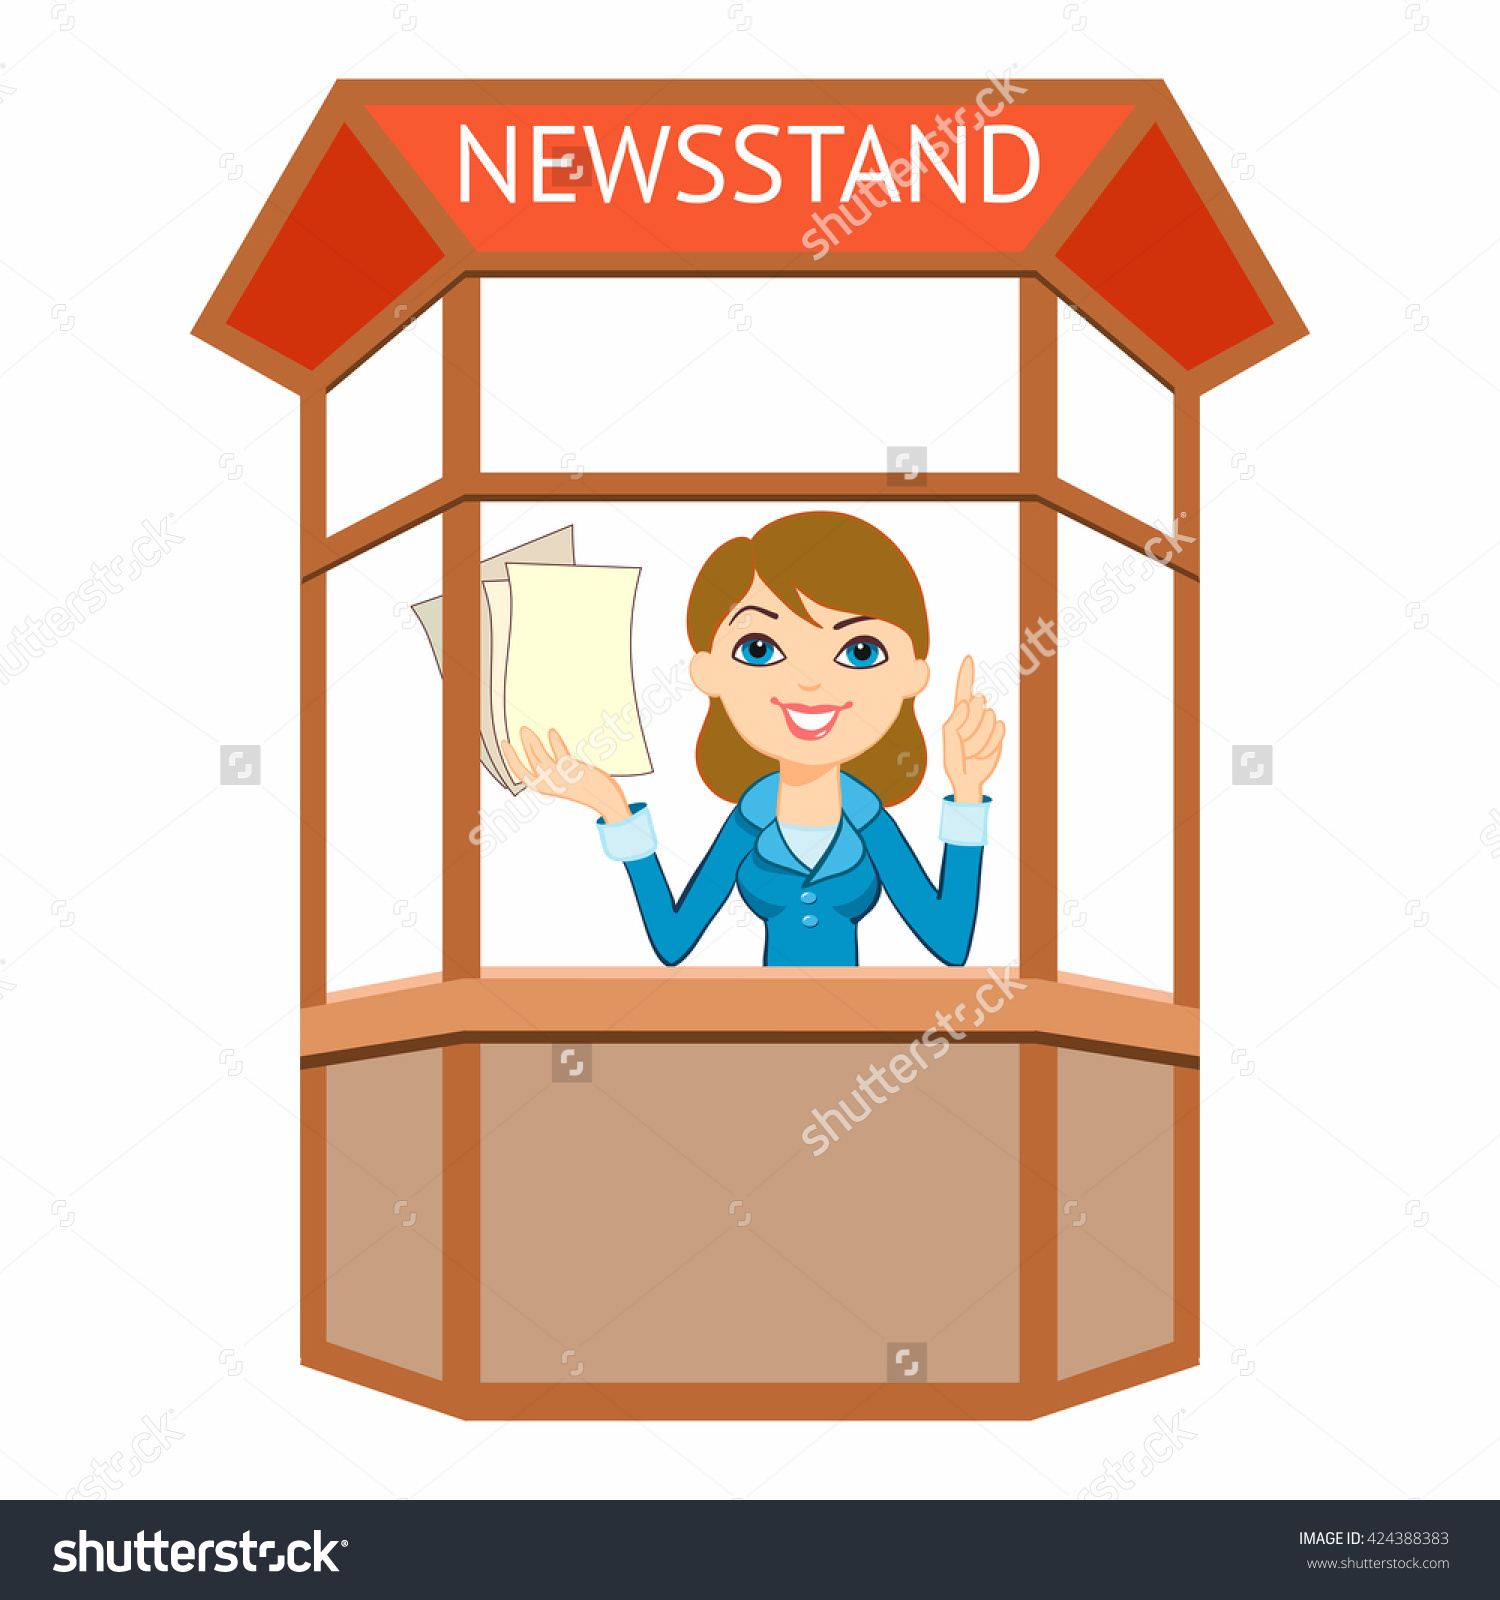 Happy Saleswoman, Shop Assistant, Newsagent, Press, Newspapers.